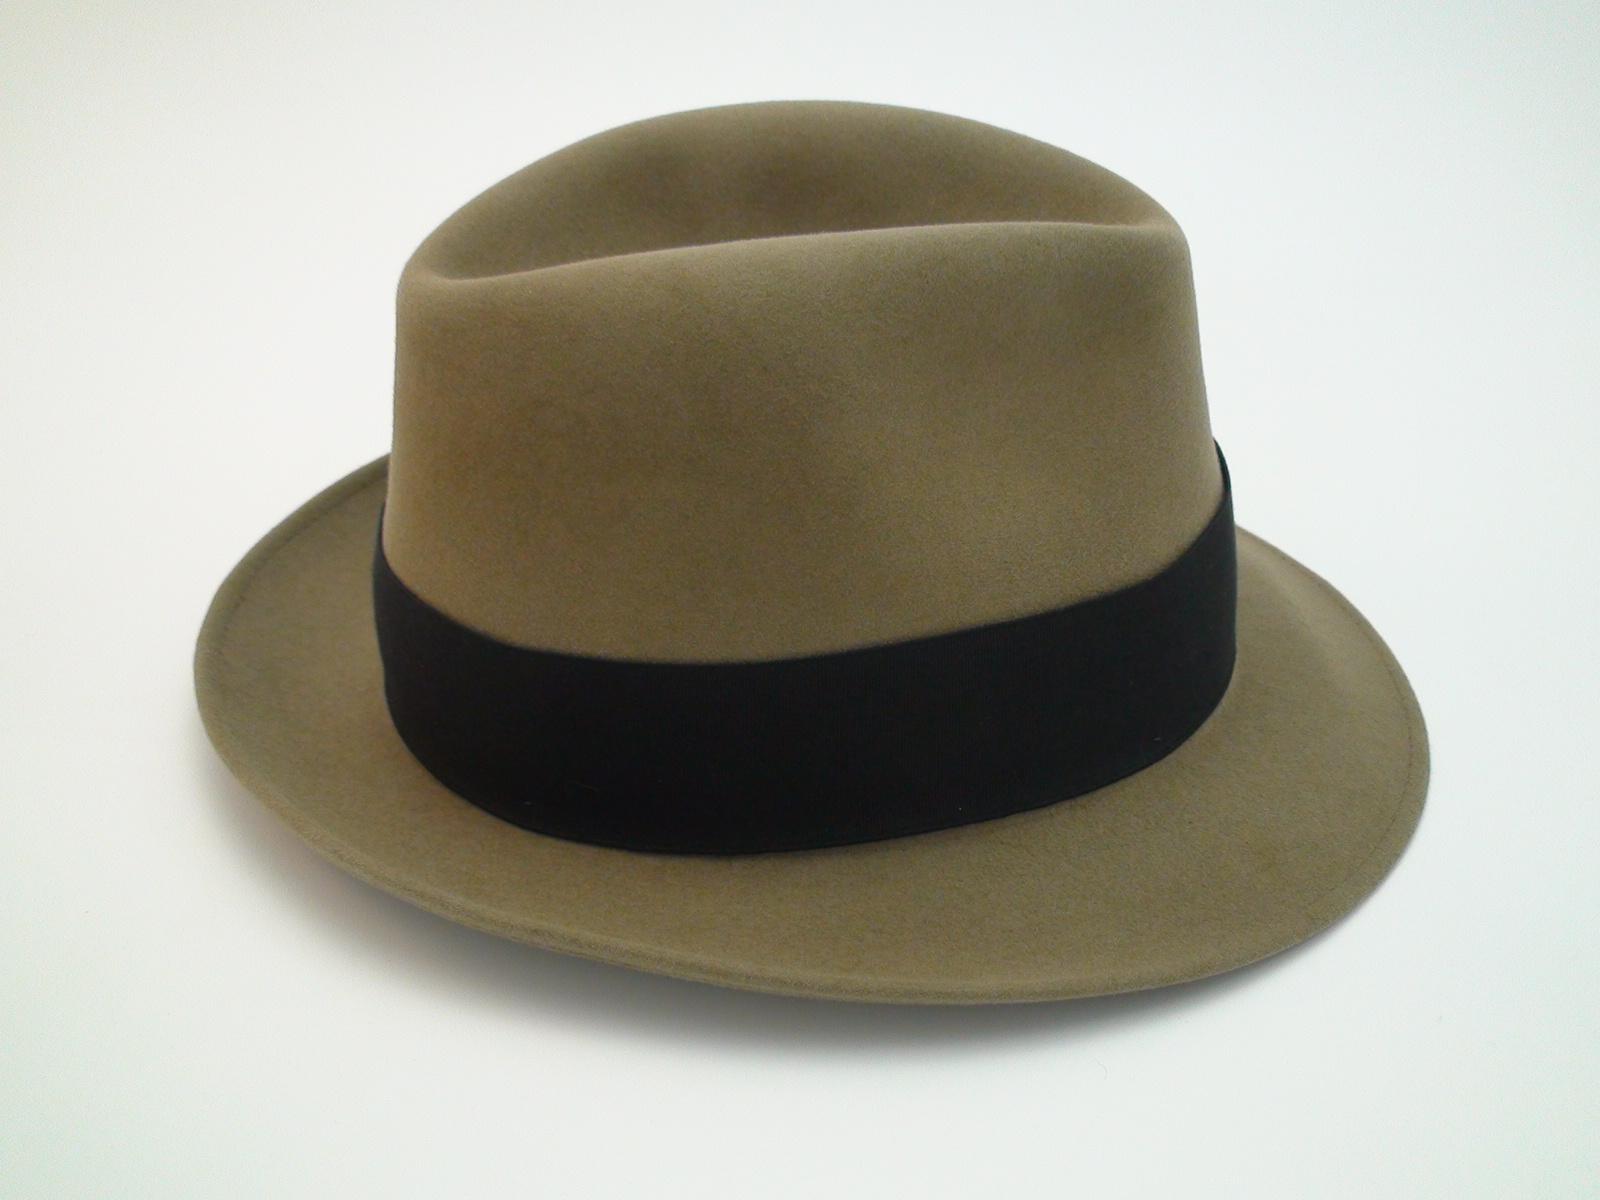 24b47fea29b7f Vintage Royal Stetson Saxon Bark Color Fur Felt Fedora Hat